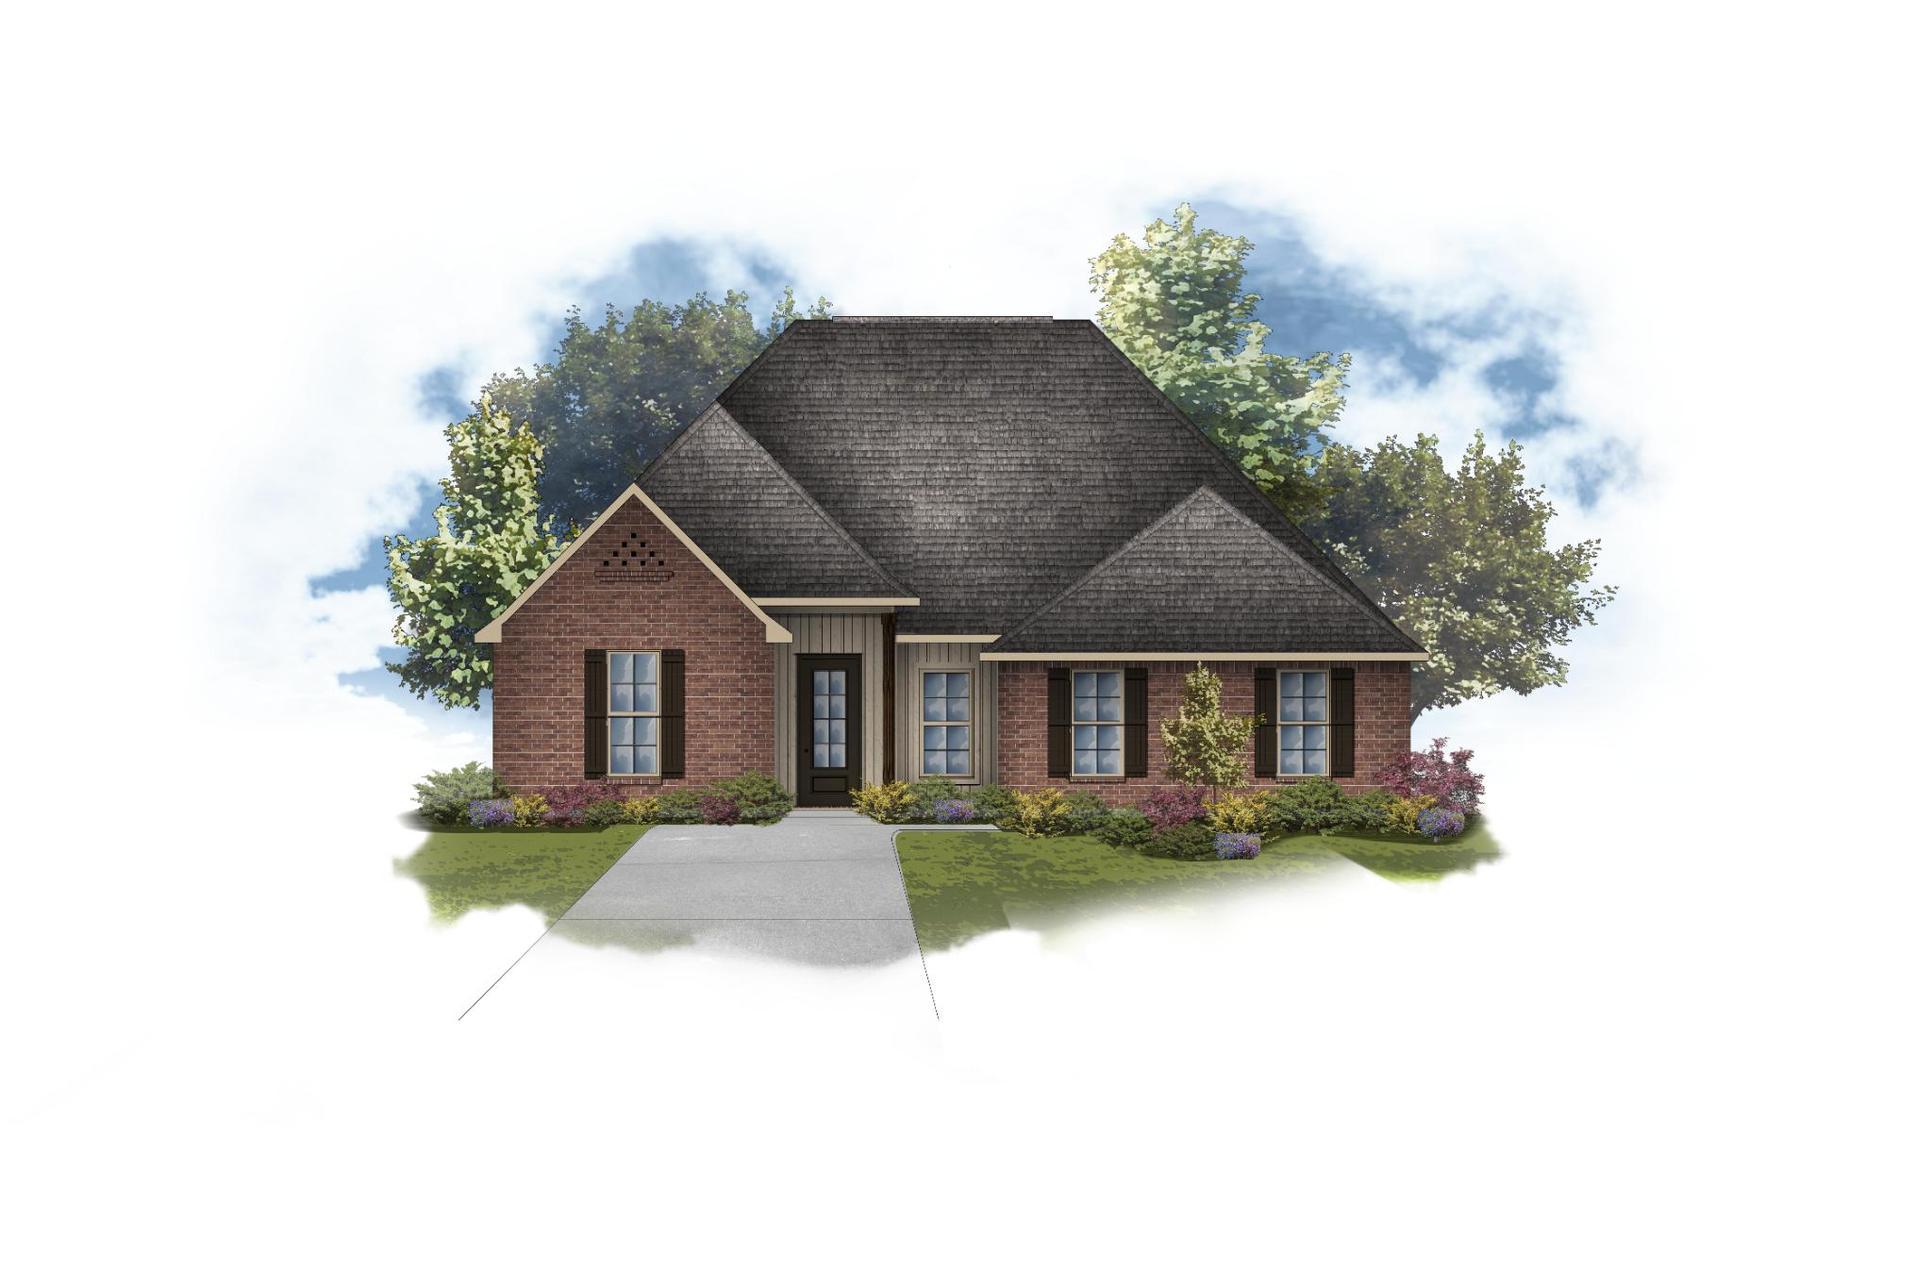 Harmand III G - Front Elevation - DSLD Homes